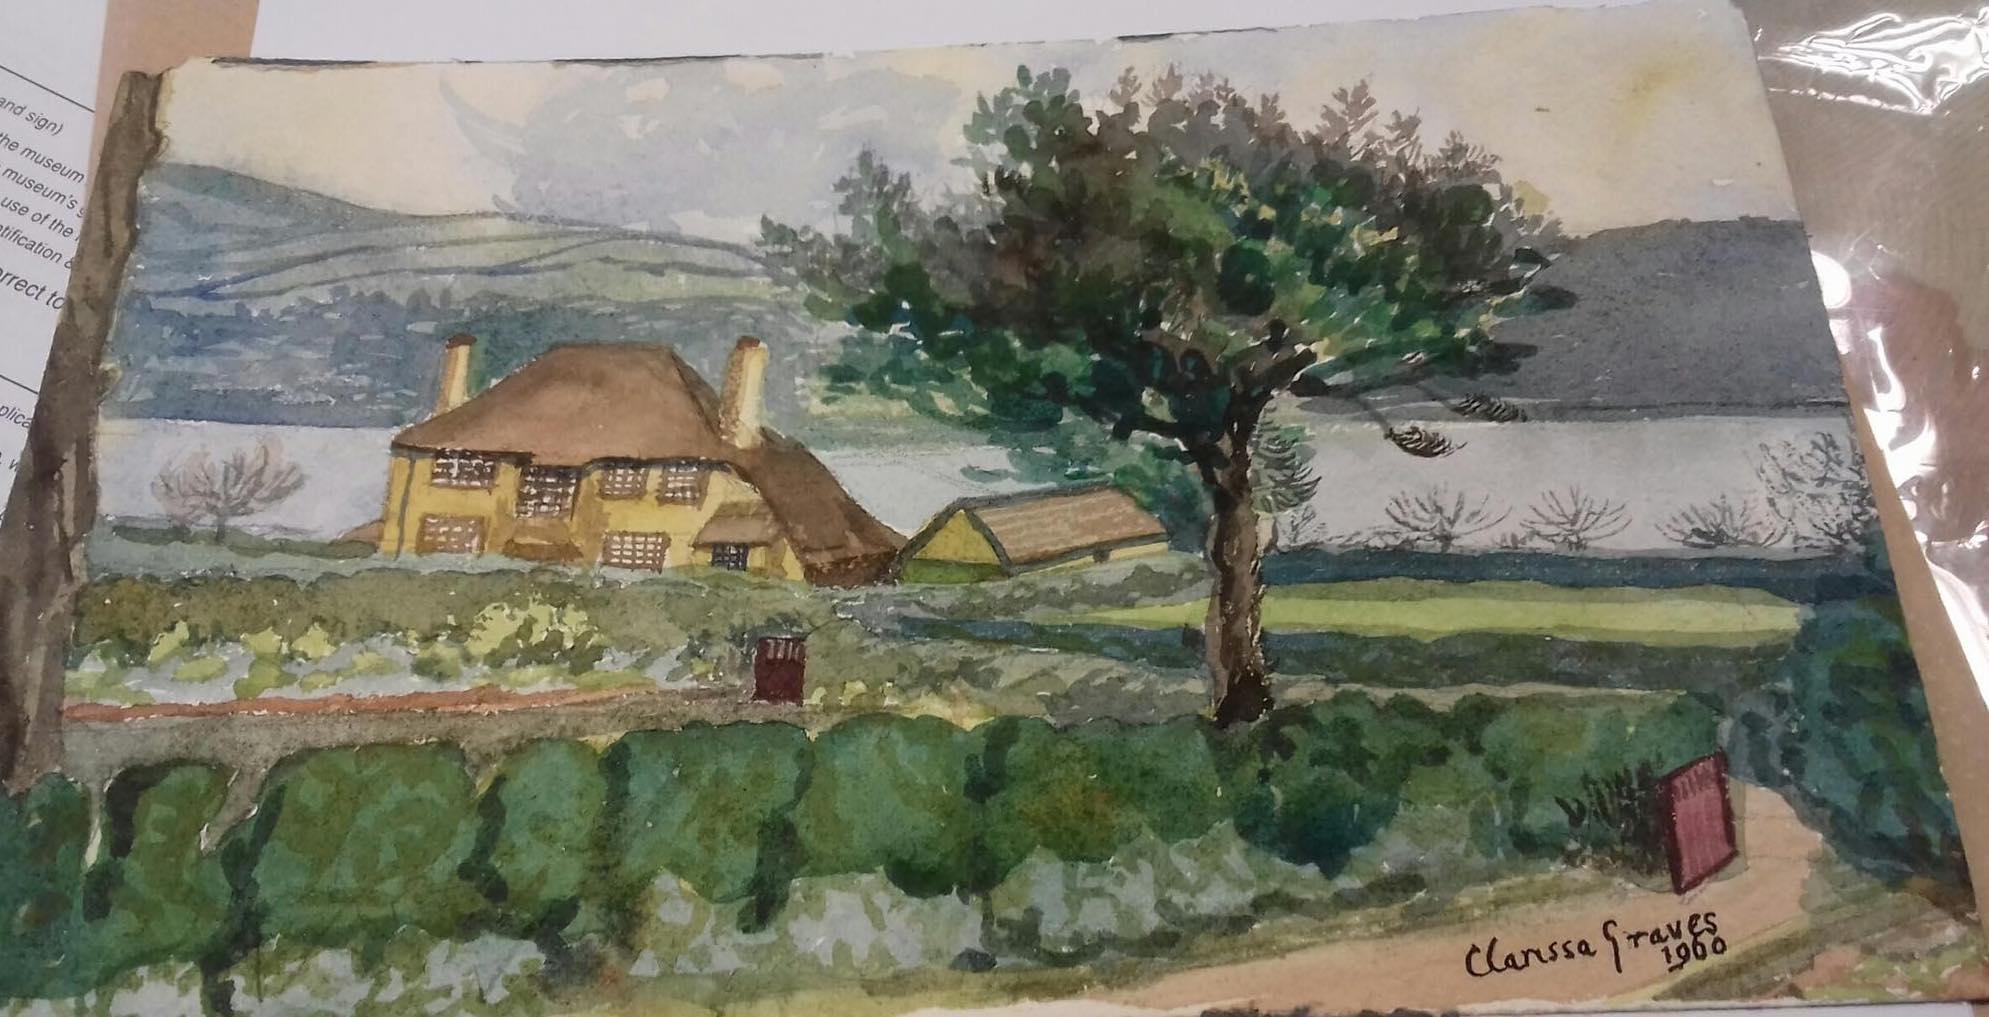 Clarissa Graves' Painting